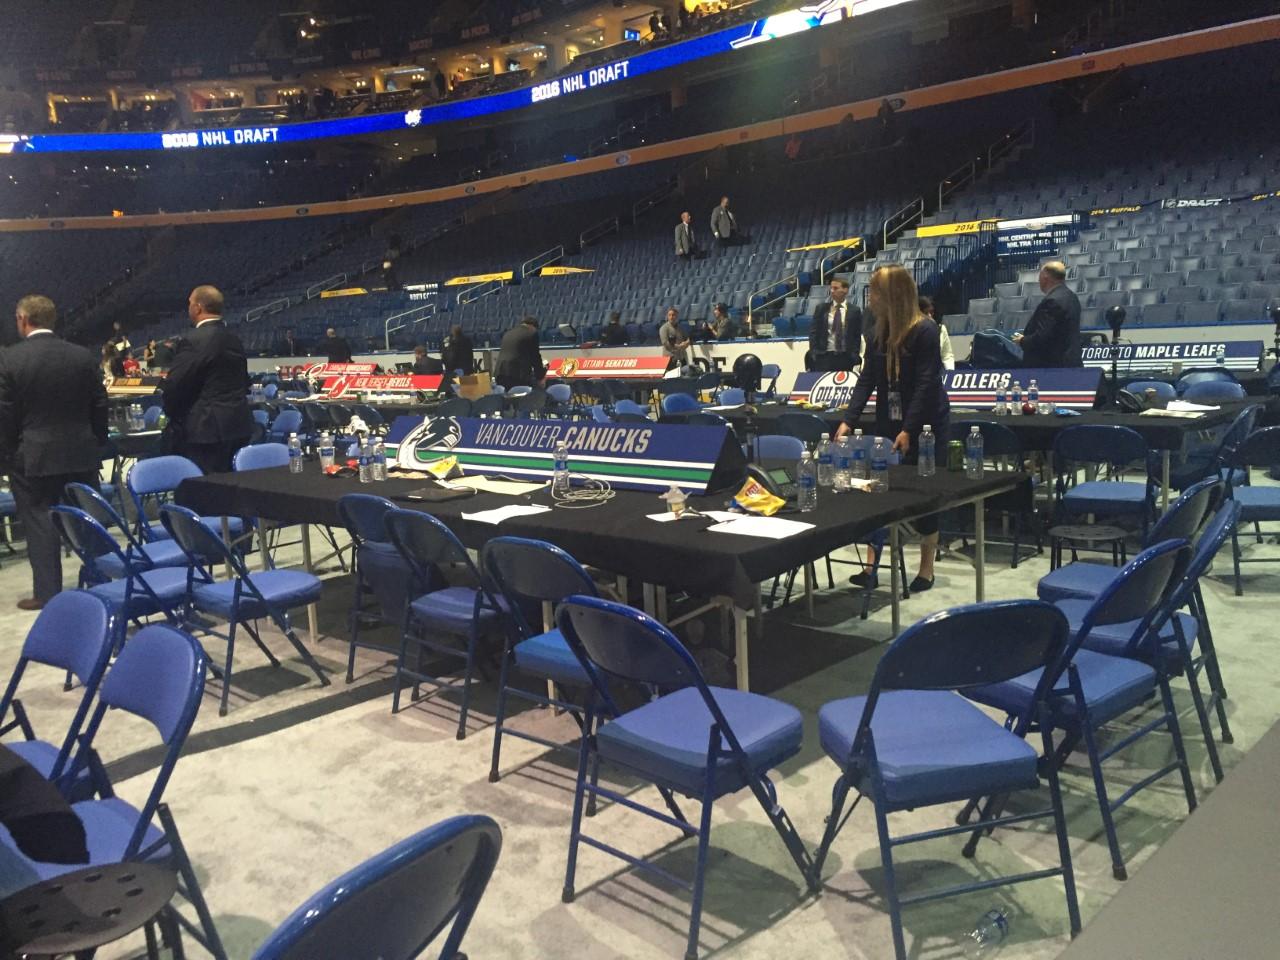 Canucks 2016 draft table